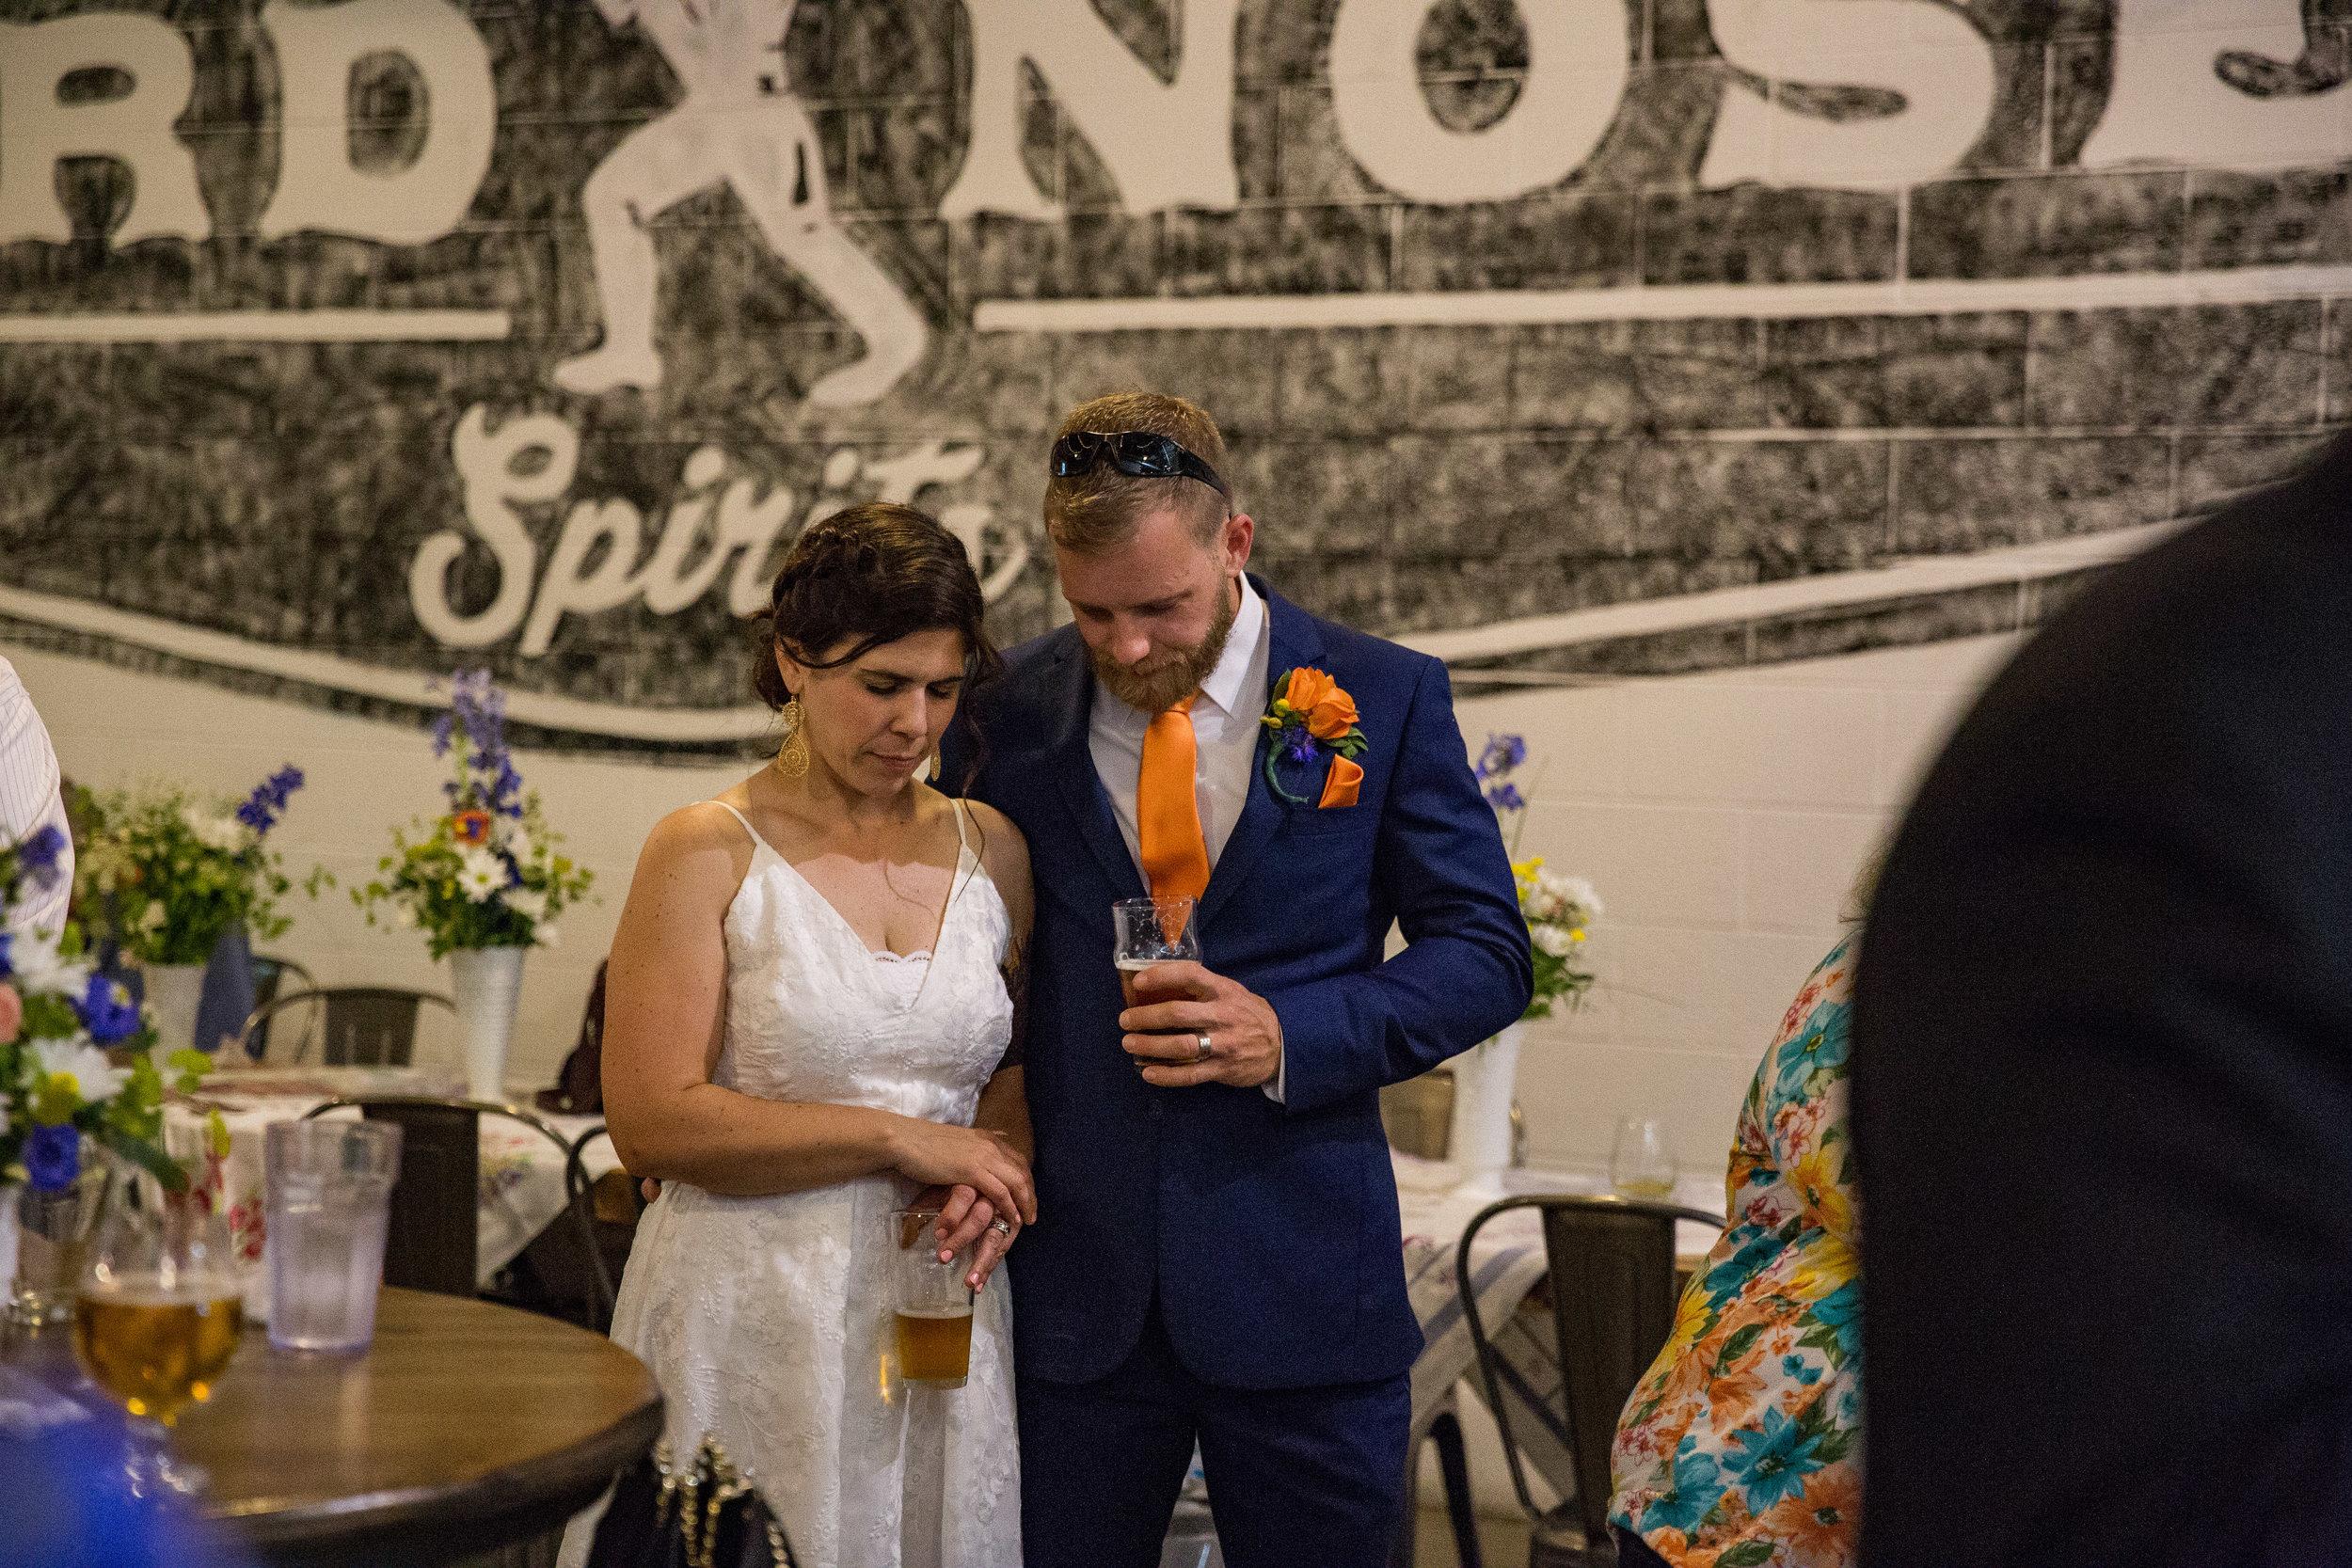 Natalie and Dallas Mooney Wedding 6-8-19_Tania Watt Photography-485.jpg